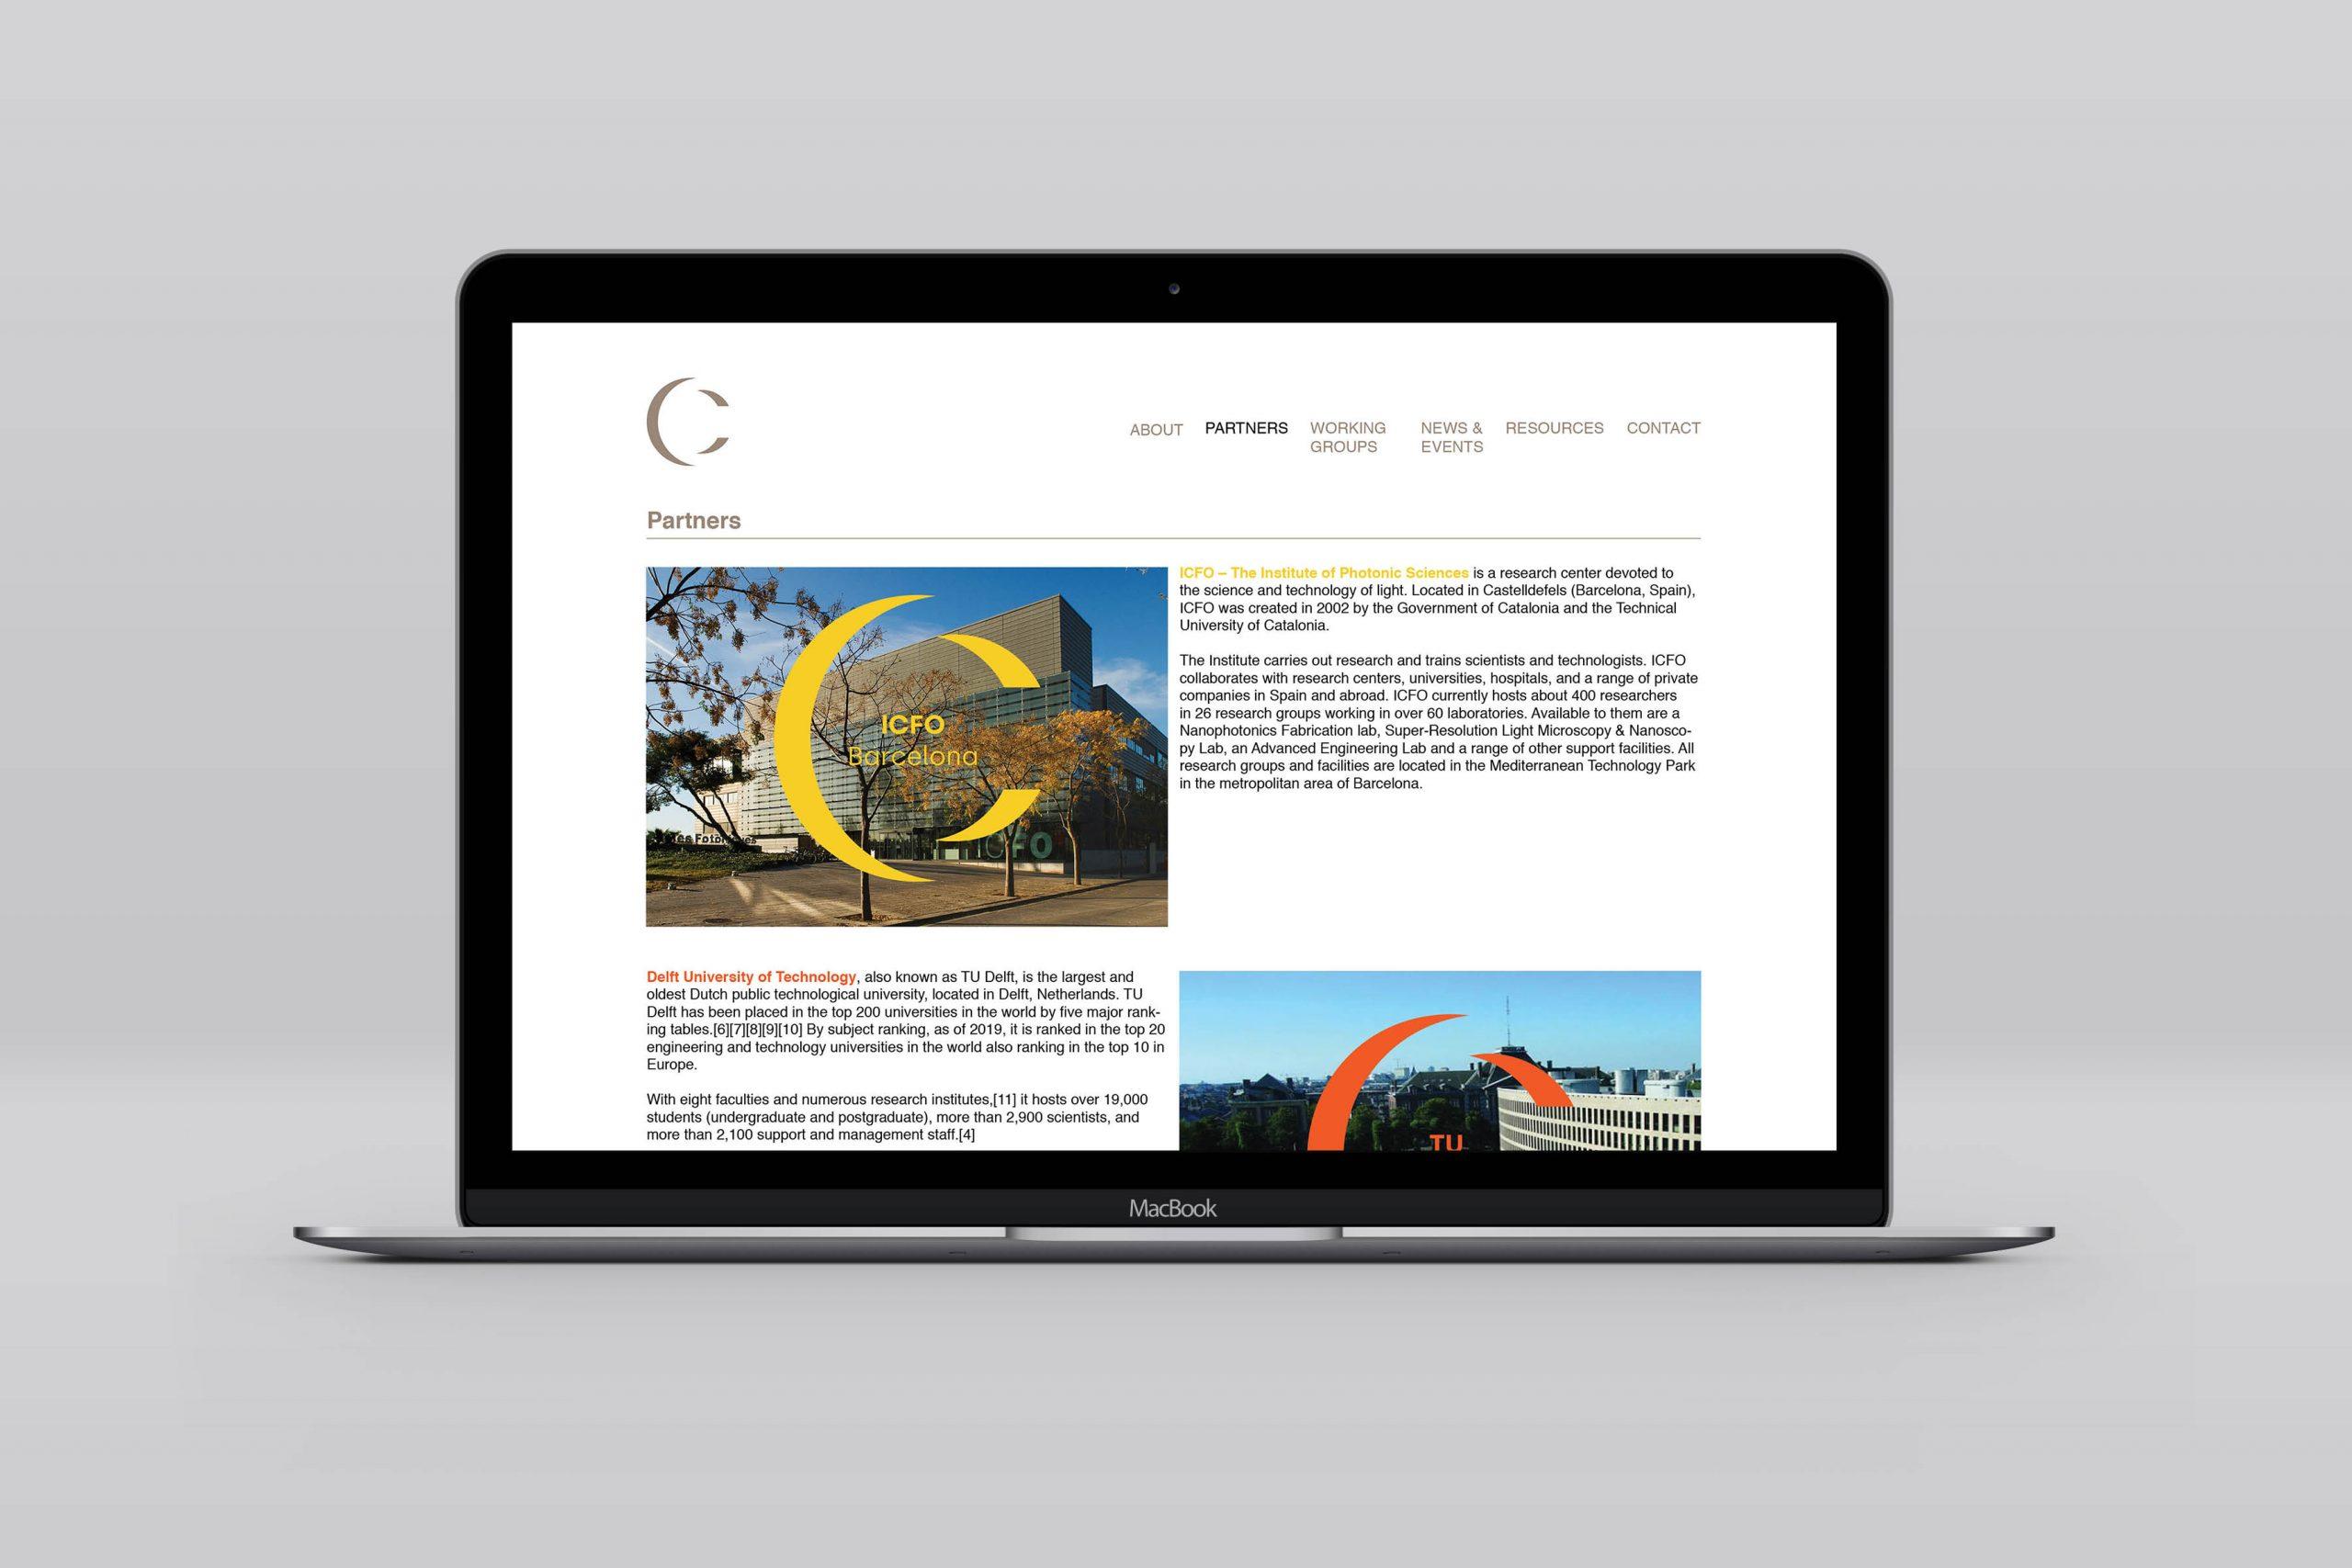 Bitflow-studio-carla-web-design-3